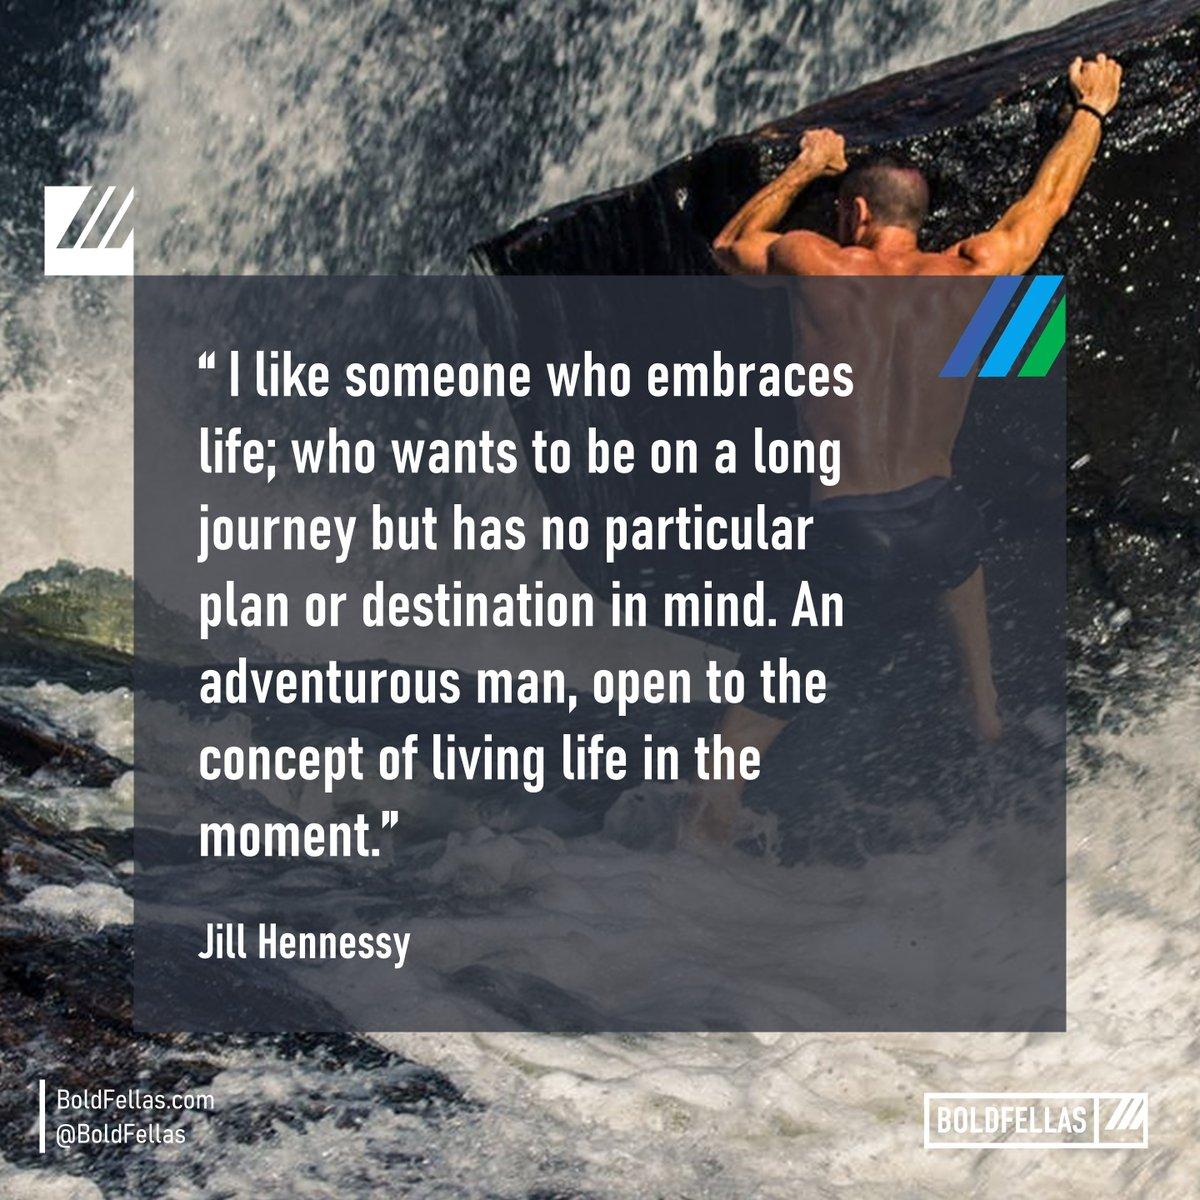 BECAUSE THE WORLD NEEDS WISE, VENTUROUS & FAITHFUL MEN. ☞ Follow @BoldFellas  for more  ////////////  #Career  #travel  #roadtrip  #happiness  #explore  #adventure  #productivity  #Leadership  #Finances  #workout  #fitness  #diet  #family  #Jesus  #catholic  #Christian  #run  #running